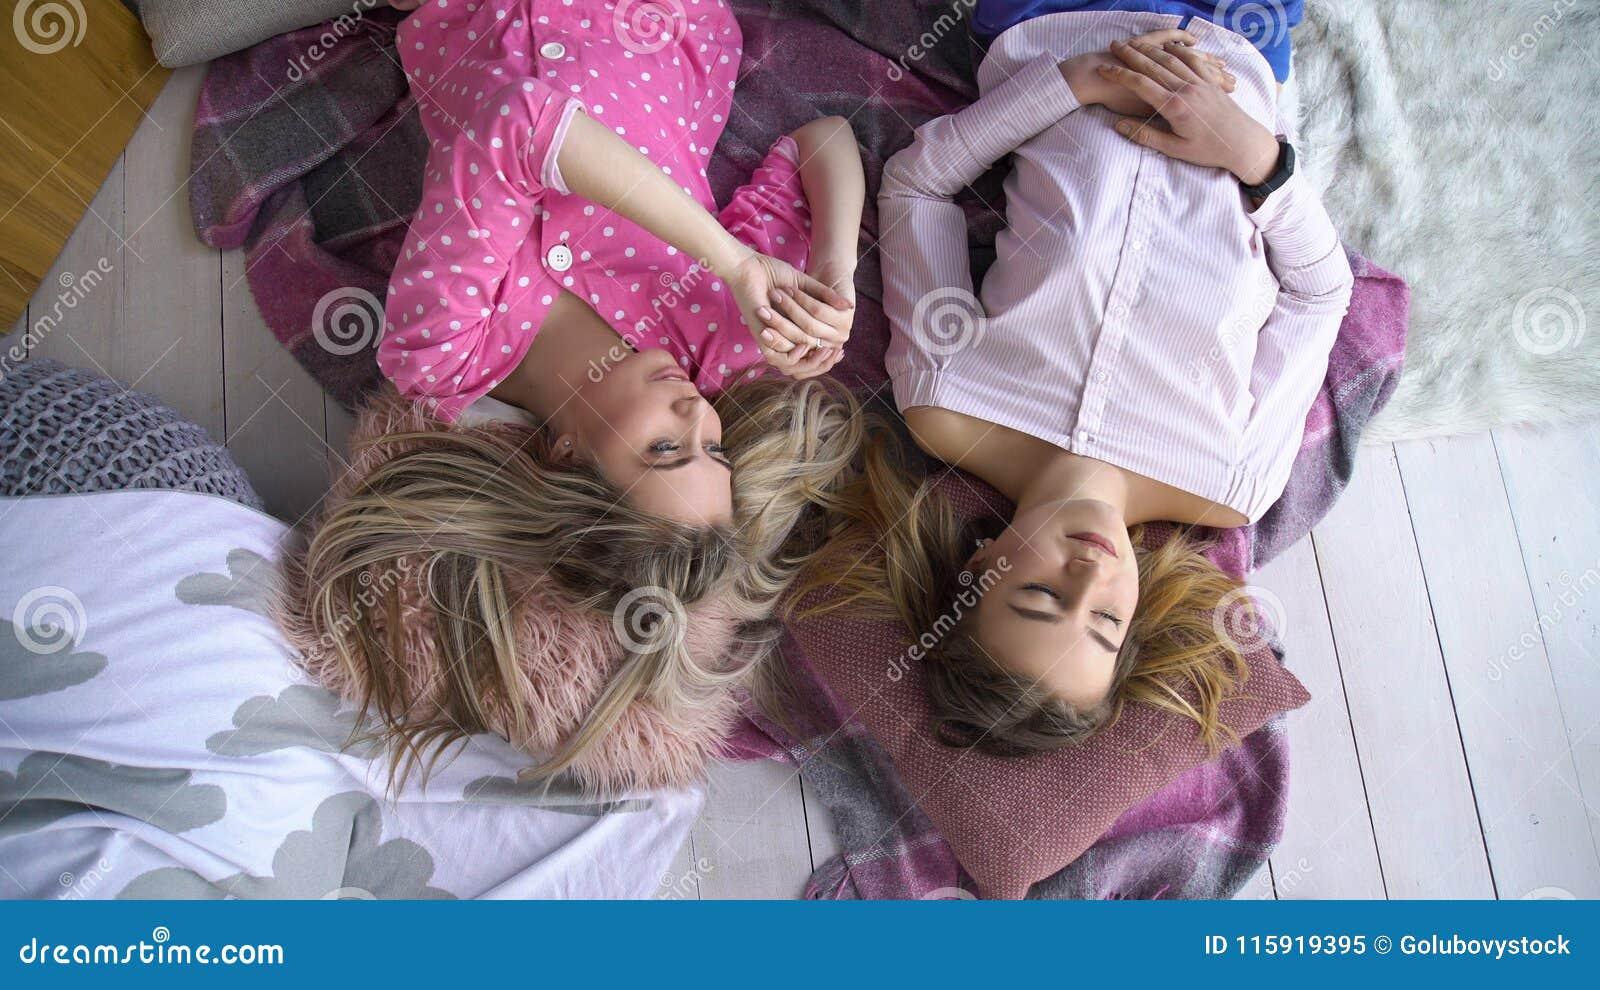 girls sharing their Bff